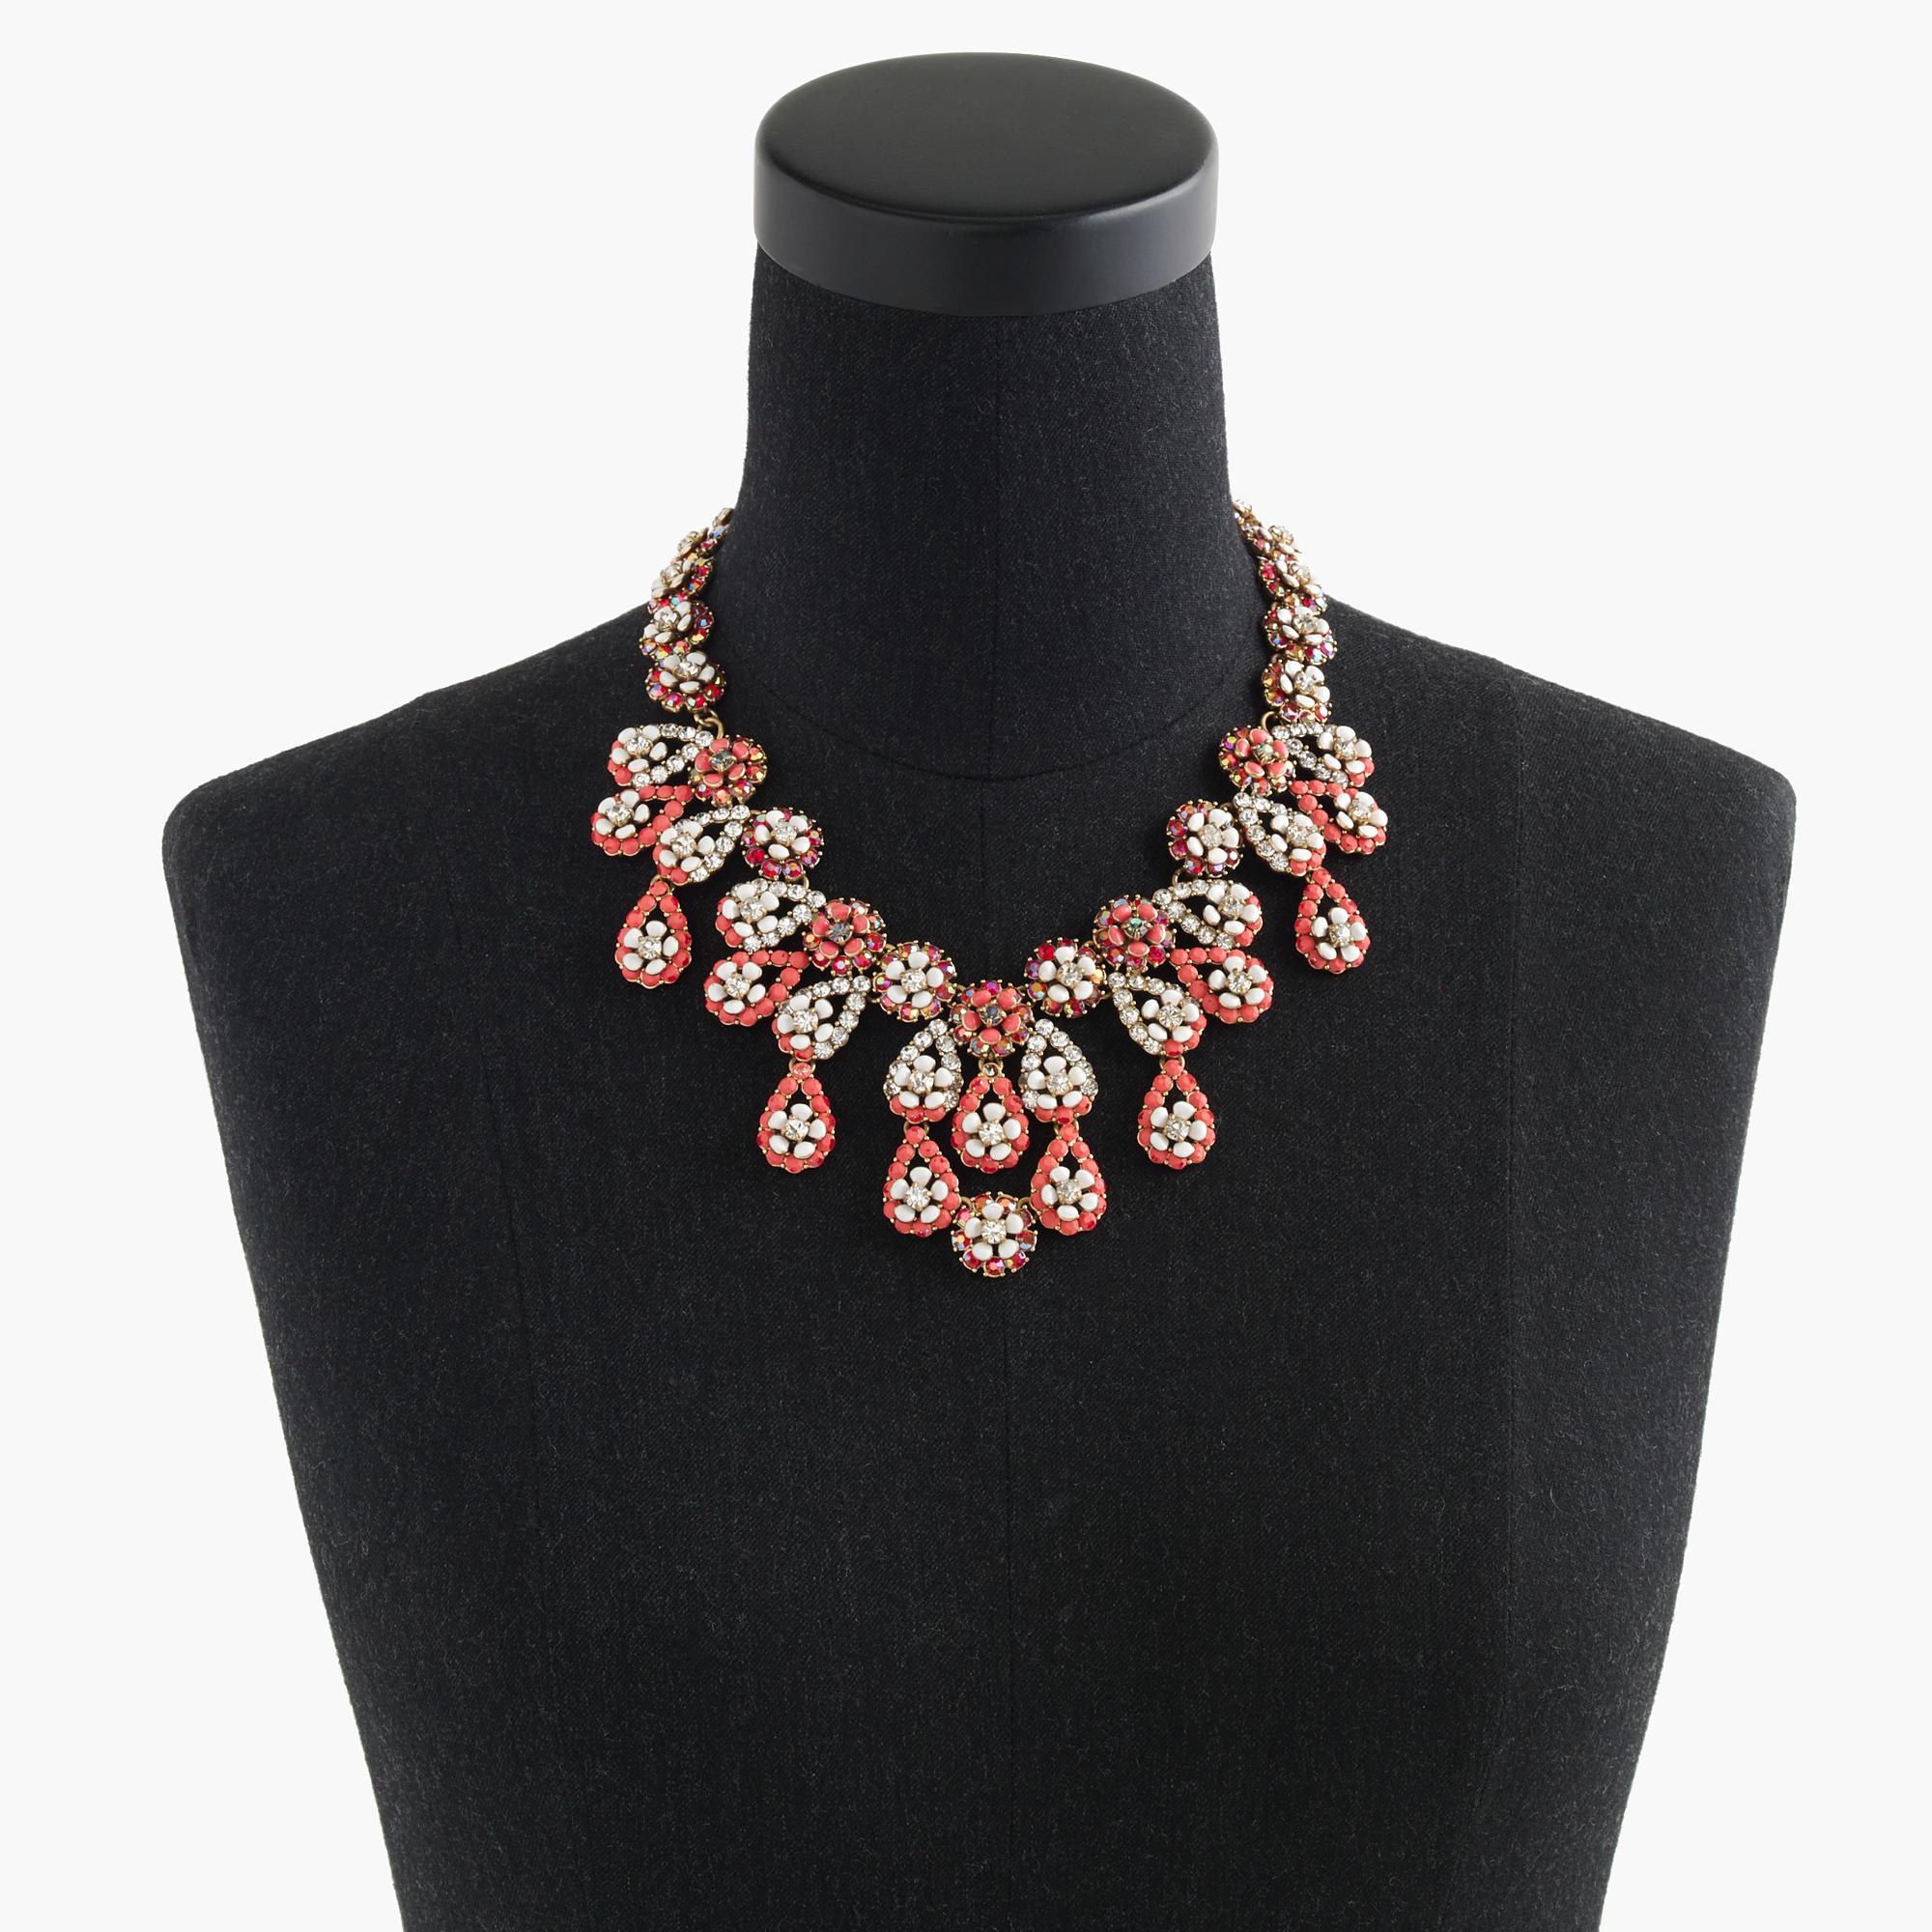 J.Crew Floral Chandelier Necklace in Orange